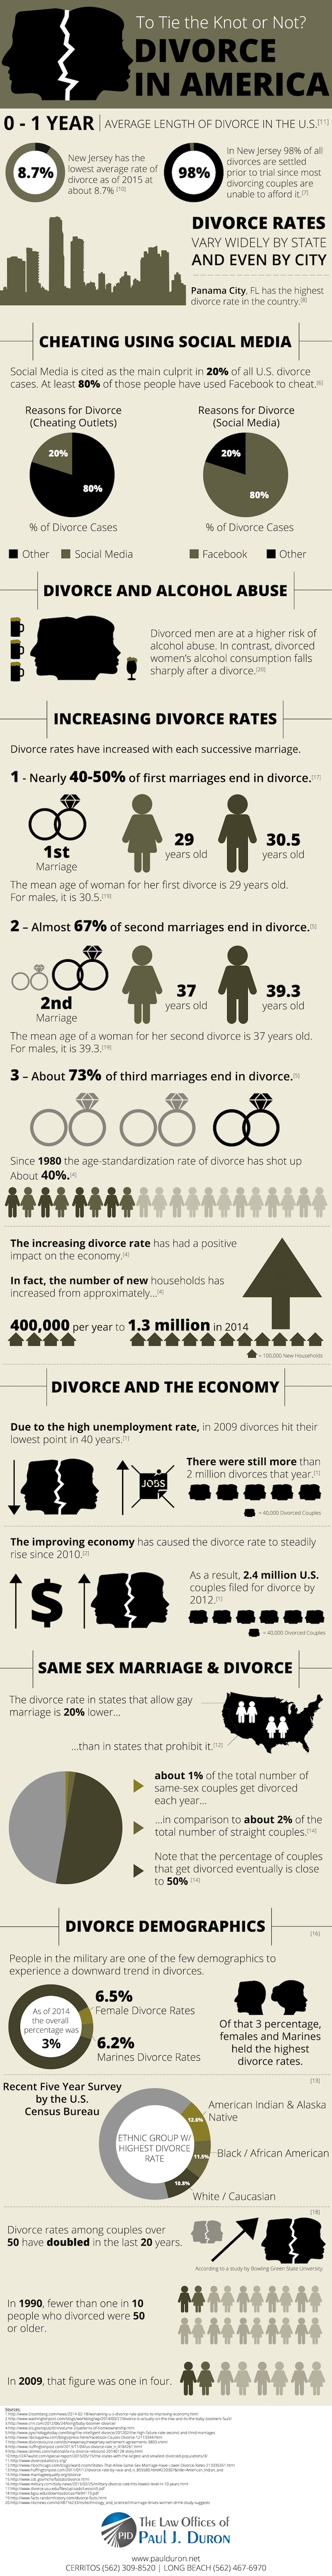 Long Beach Divorce Attorney